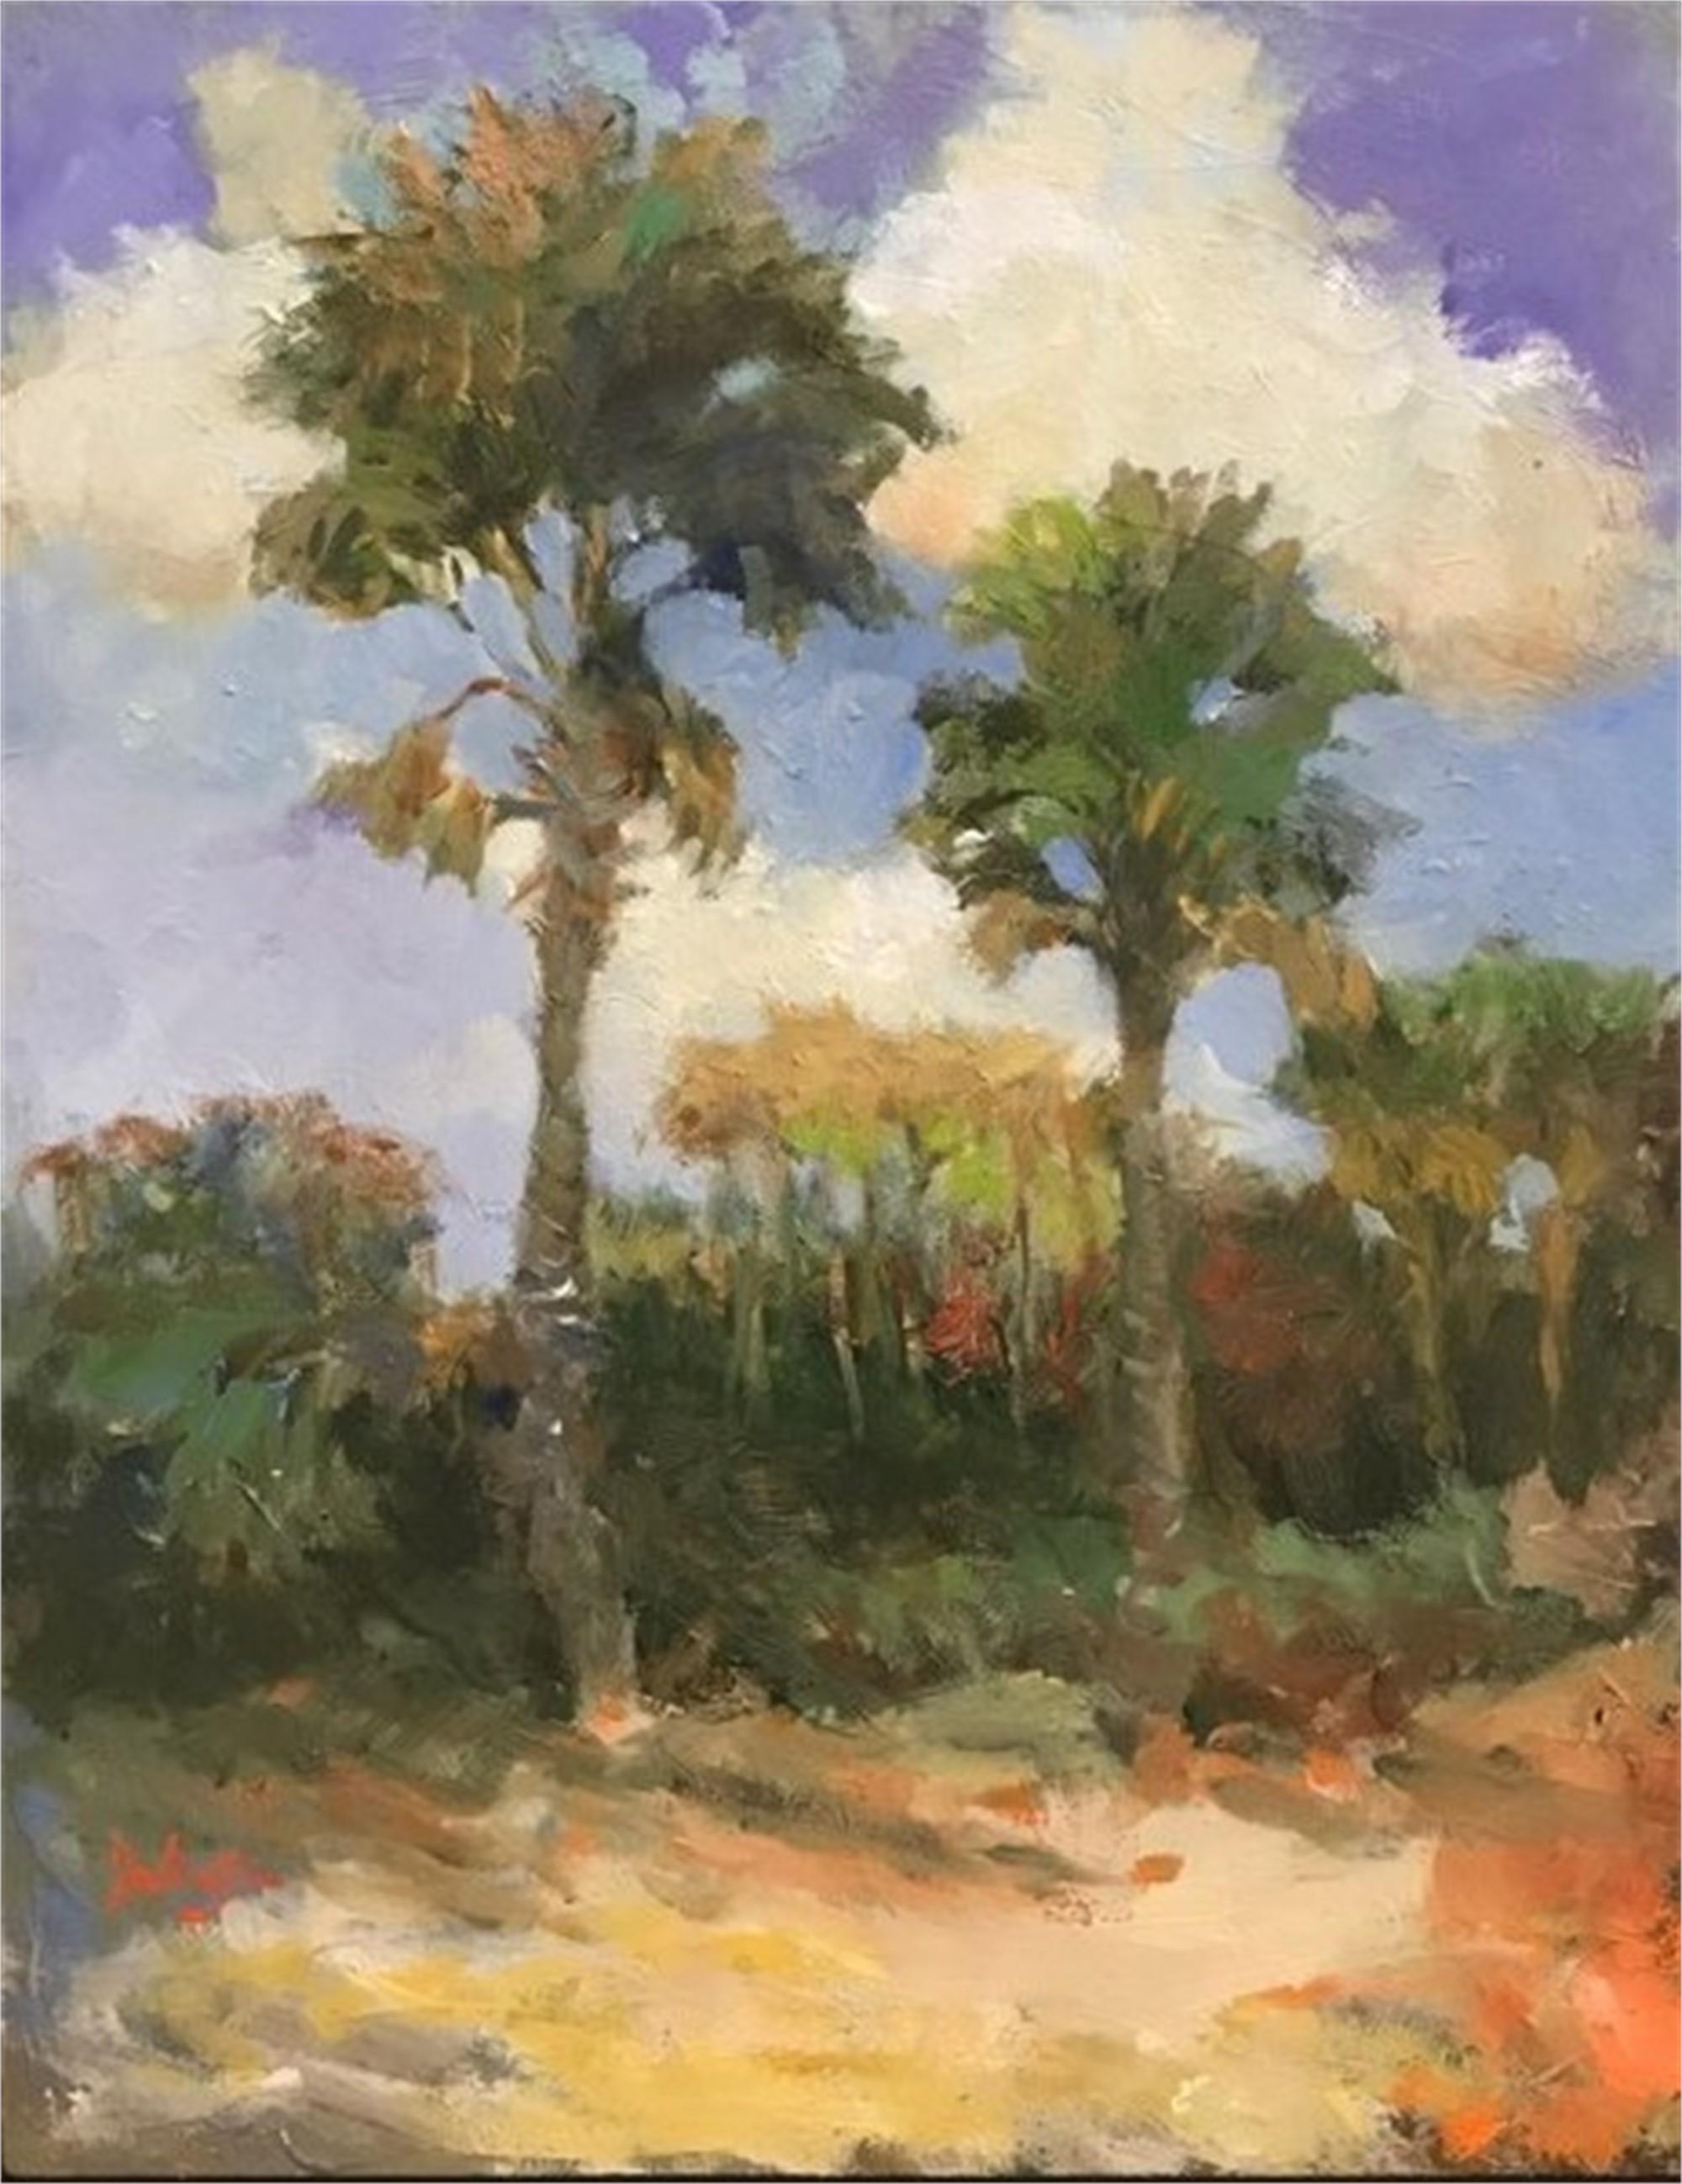 Capers Island Series no 3 - Island Jungle by Jim Darlington